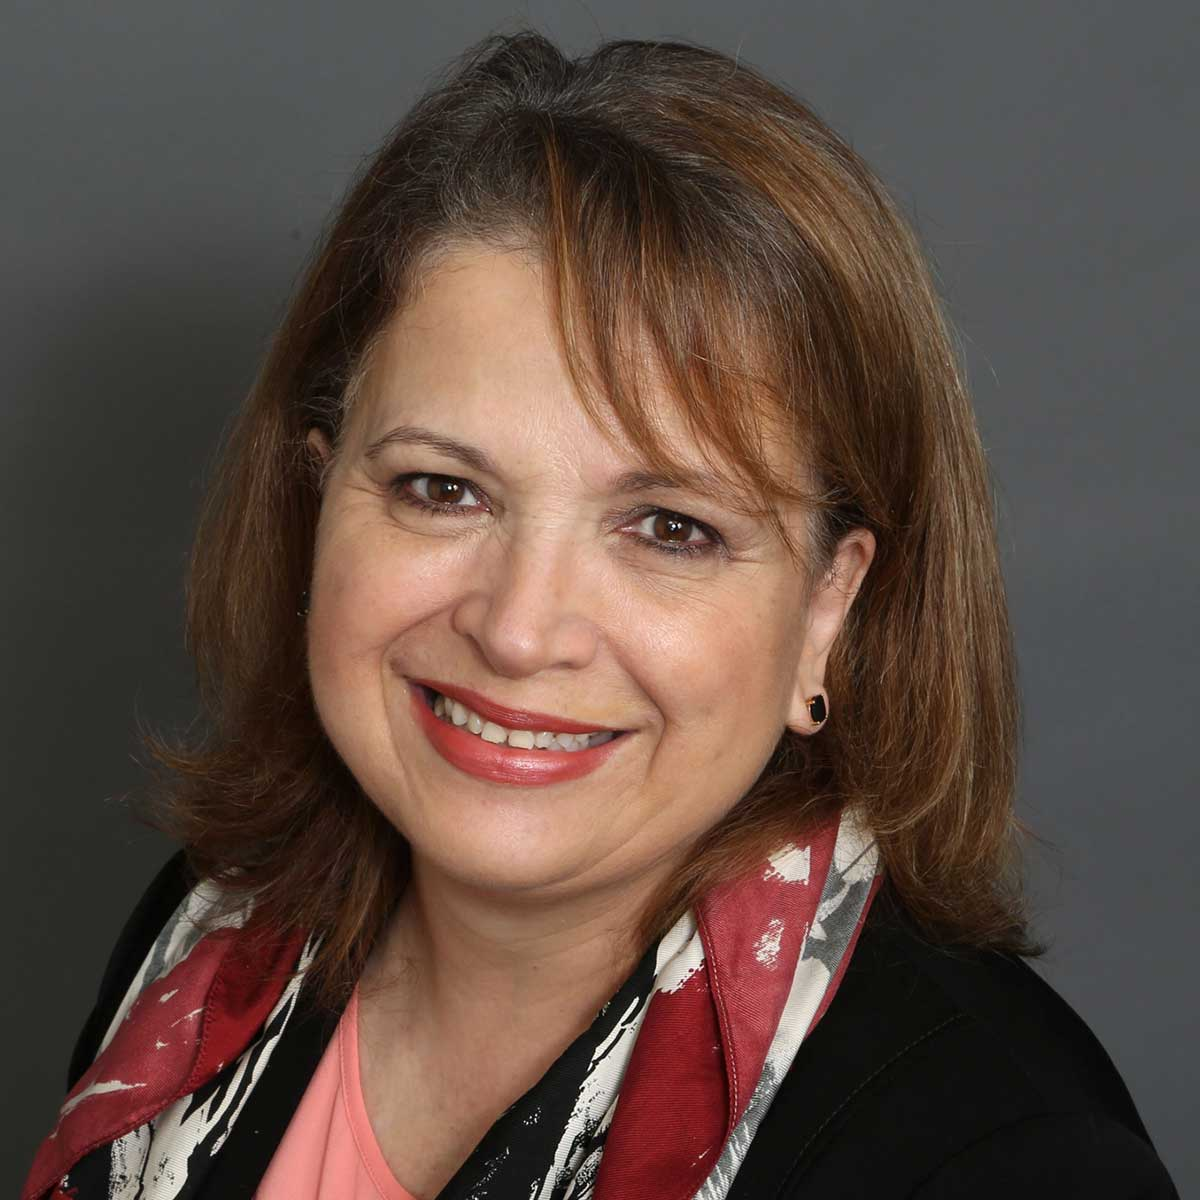 Graciela-zozaya